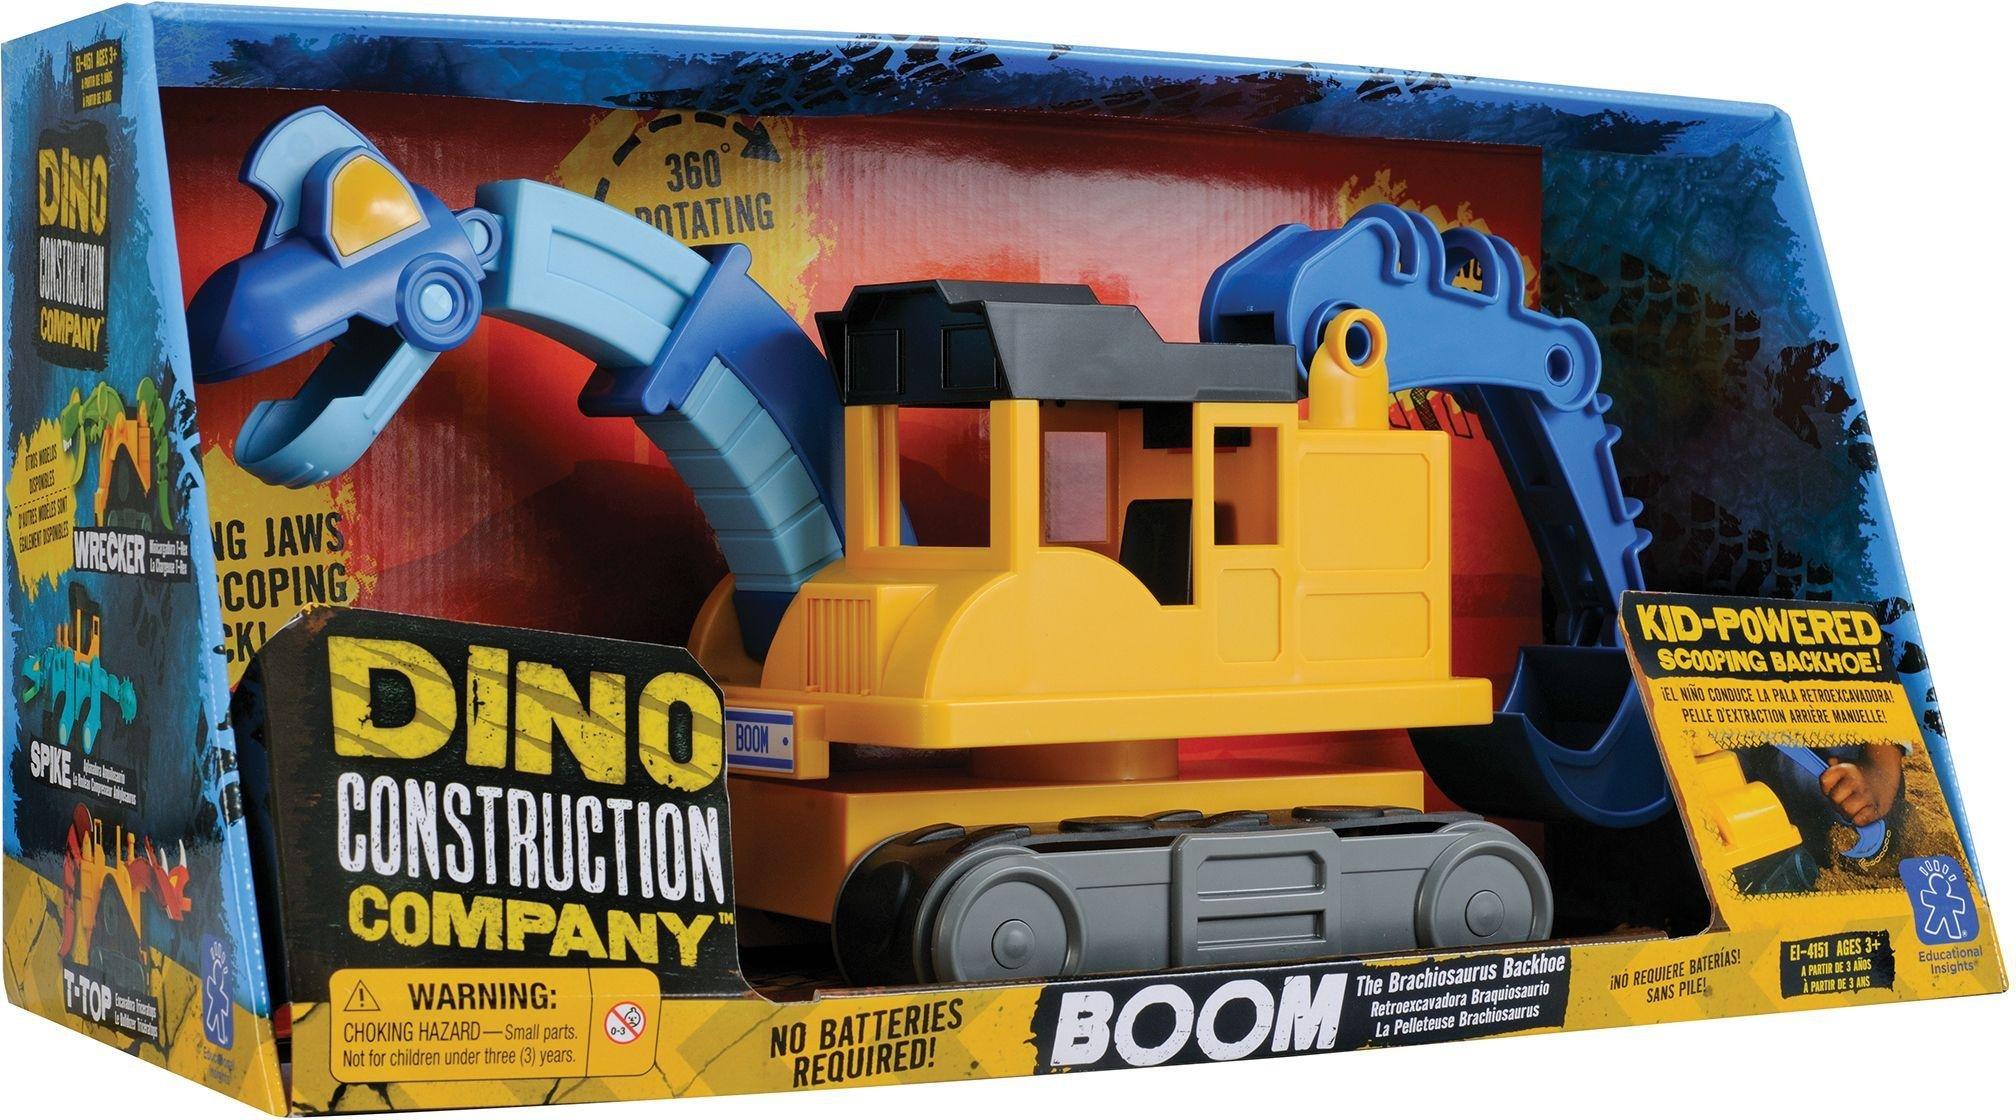 Learning Resources Ltd - Brachiosaurus Backhoe Toy.